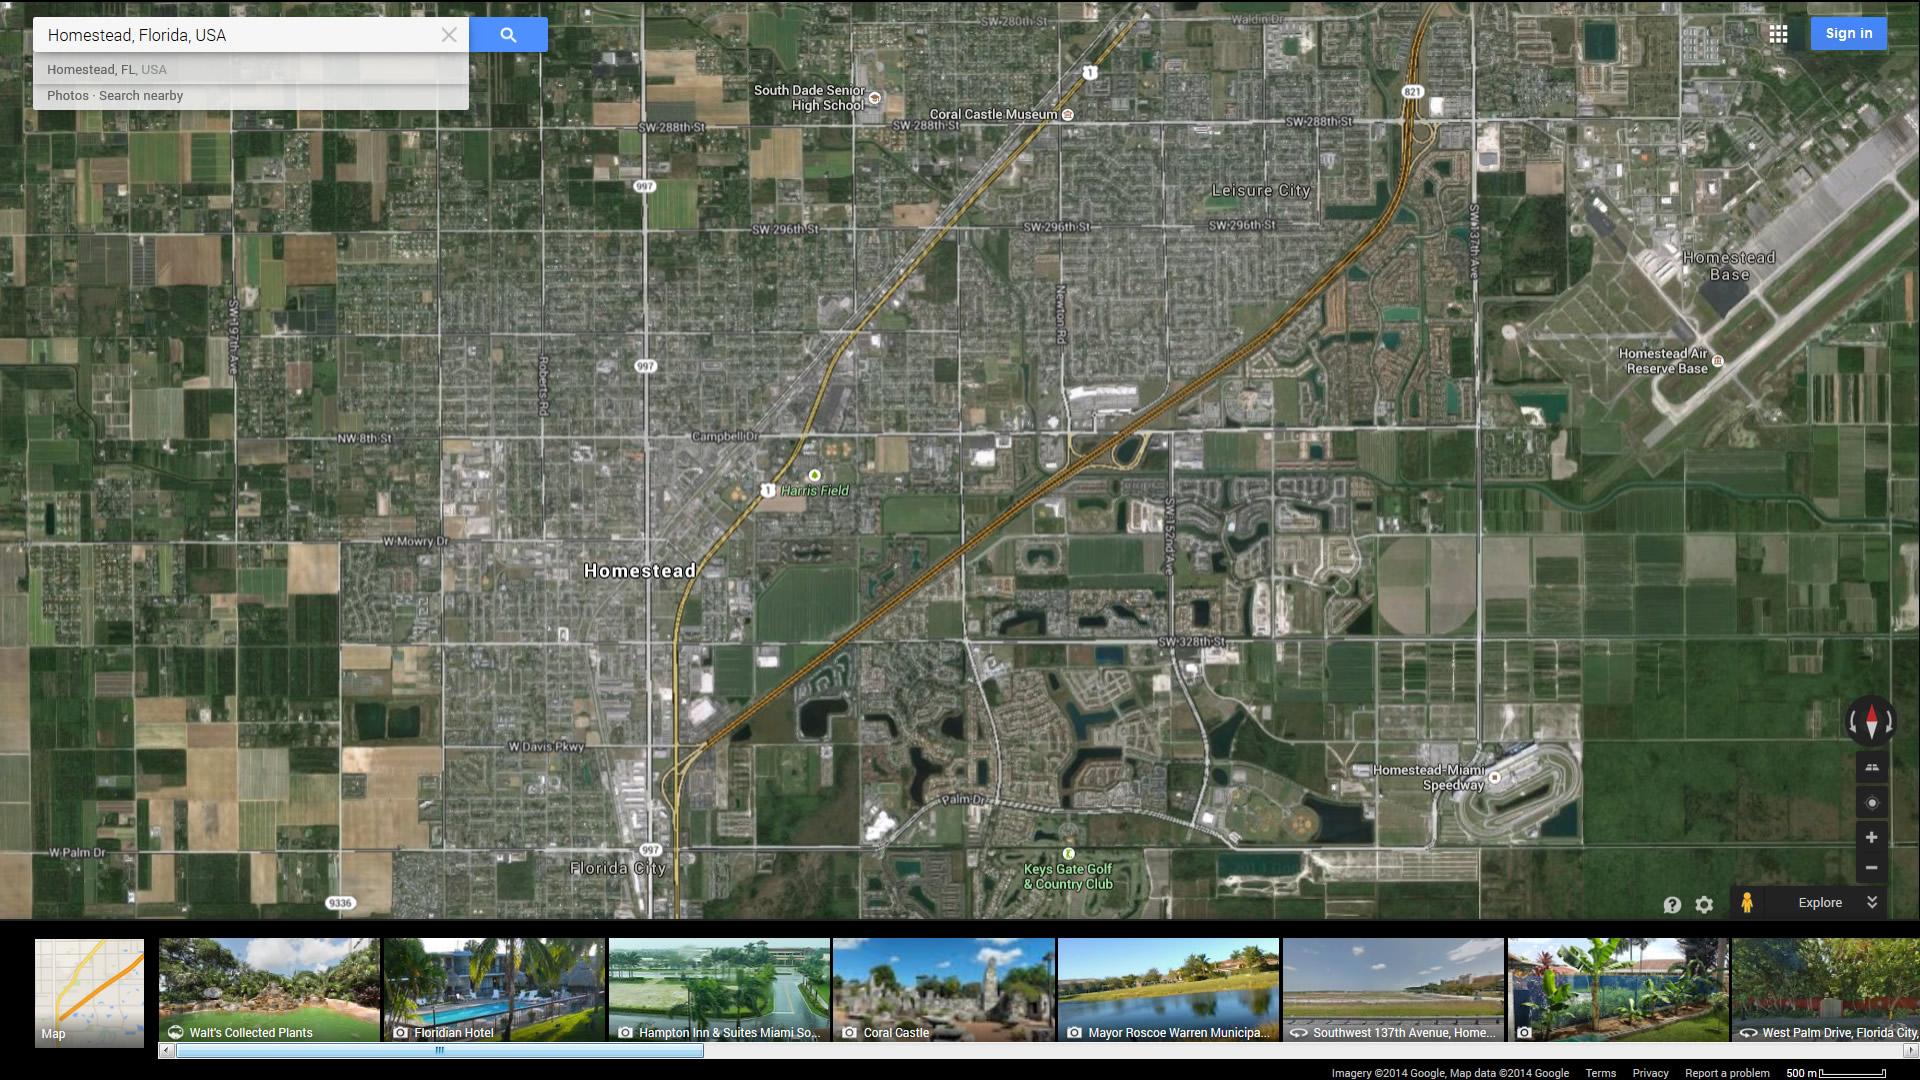 Map Of Homestead Florida.Homestead Florida Map